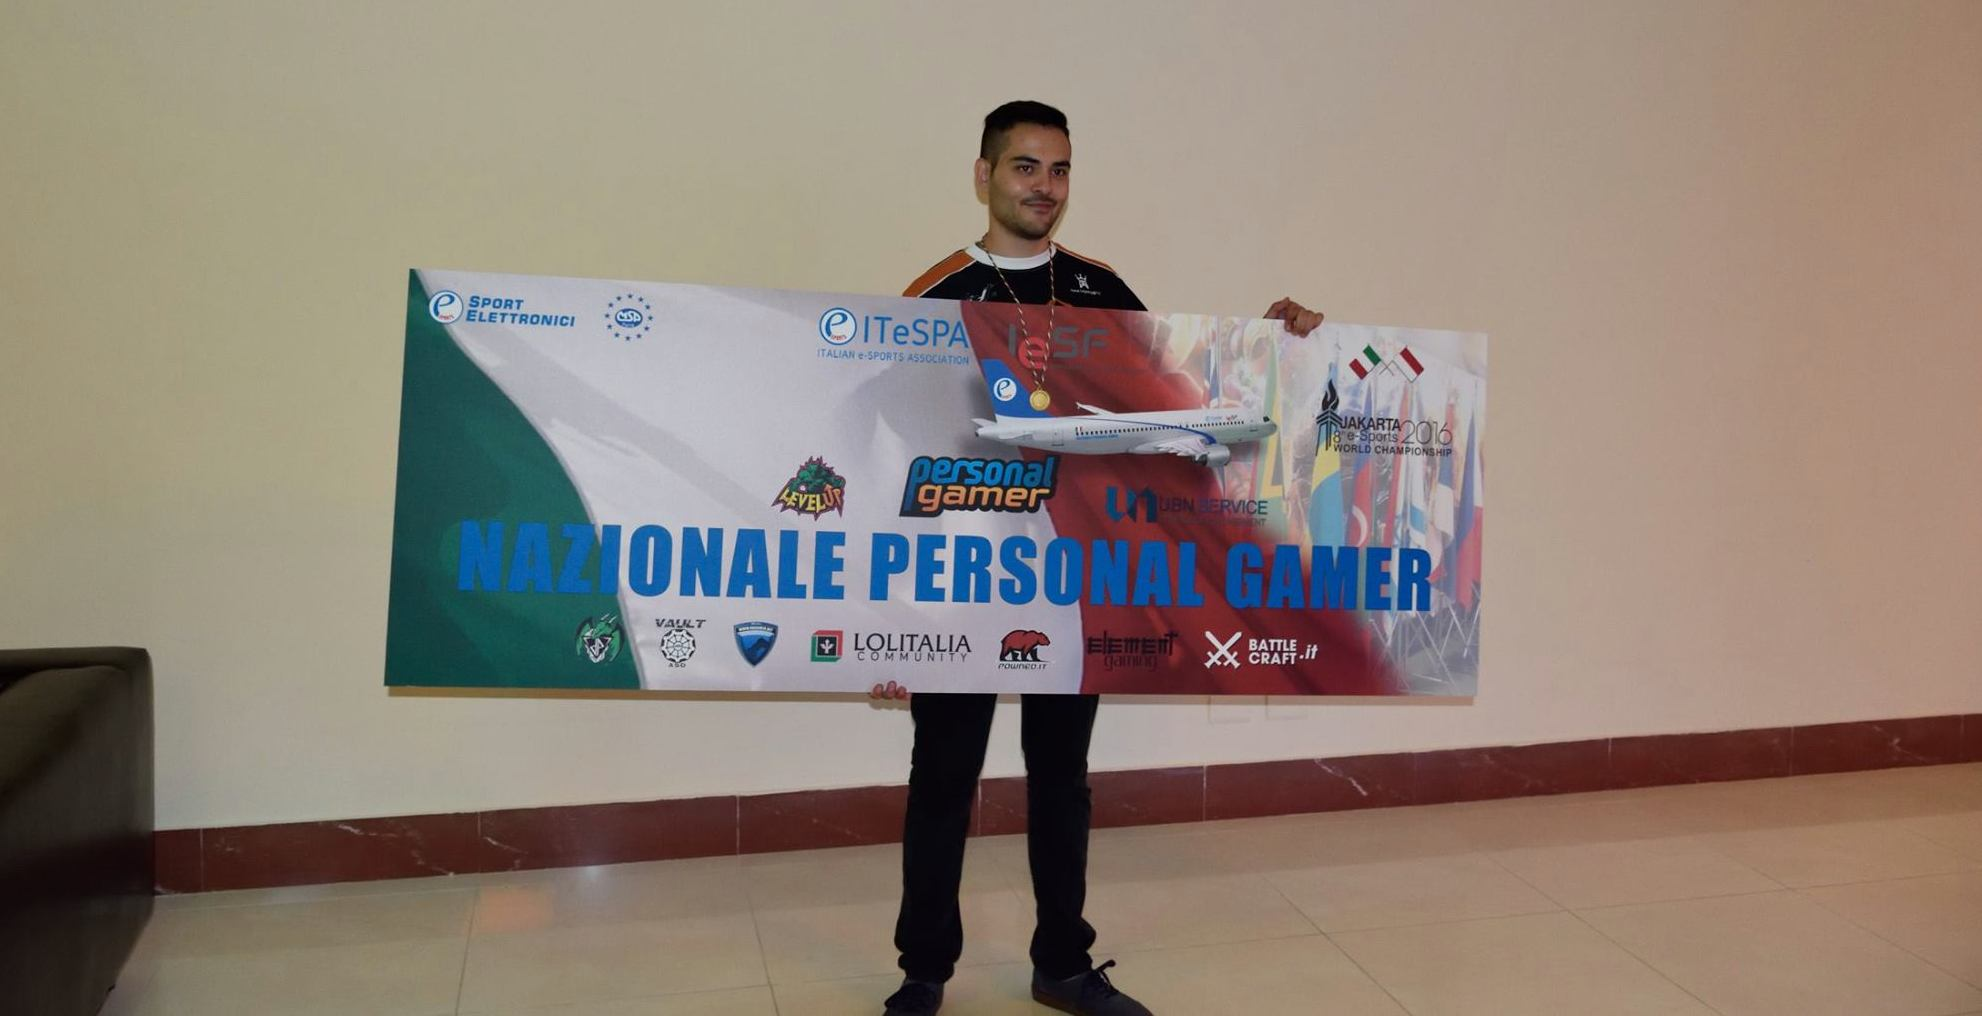 dmtk-zargon-nazionale-personal-gamer-itespa-jakarta-2016